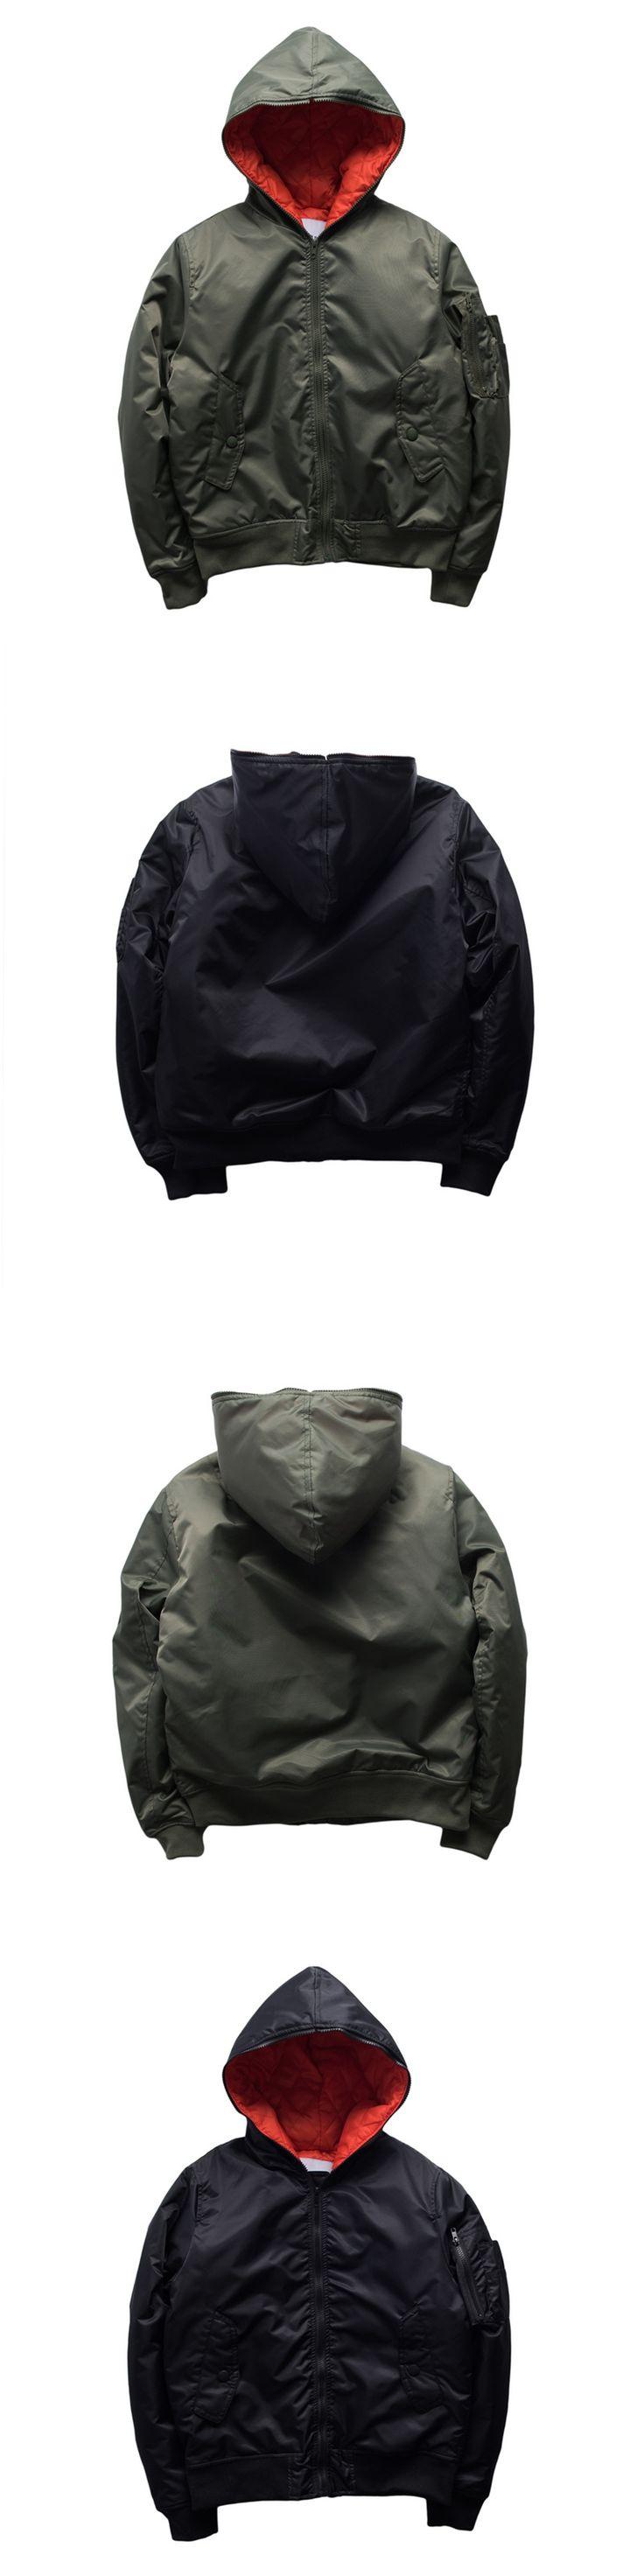 European fashion men High street autumn winter solid hooded jackets MA1 bomber jacket pocke thicker coat Warm Jacket Plus size